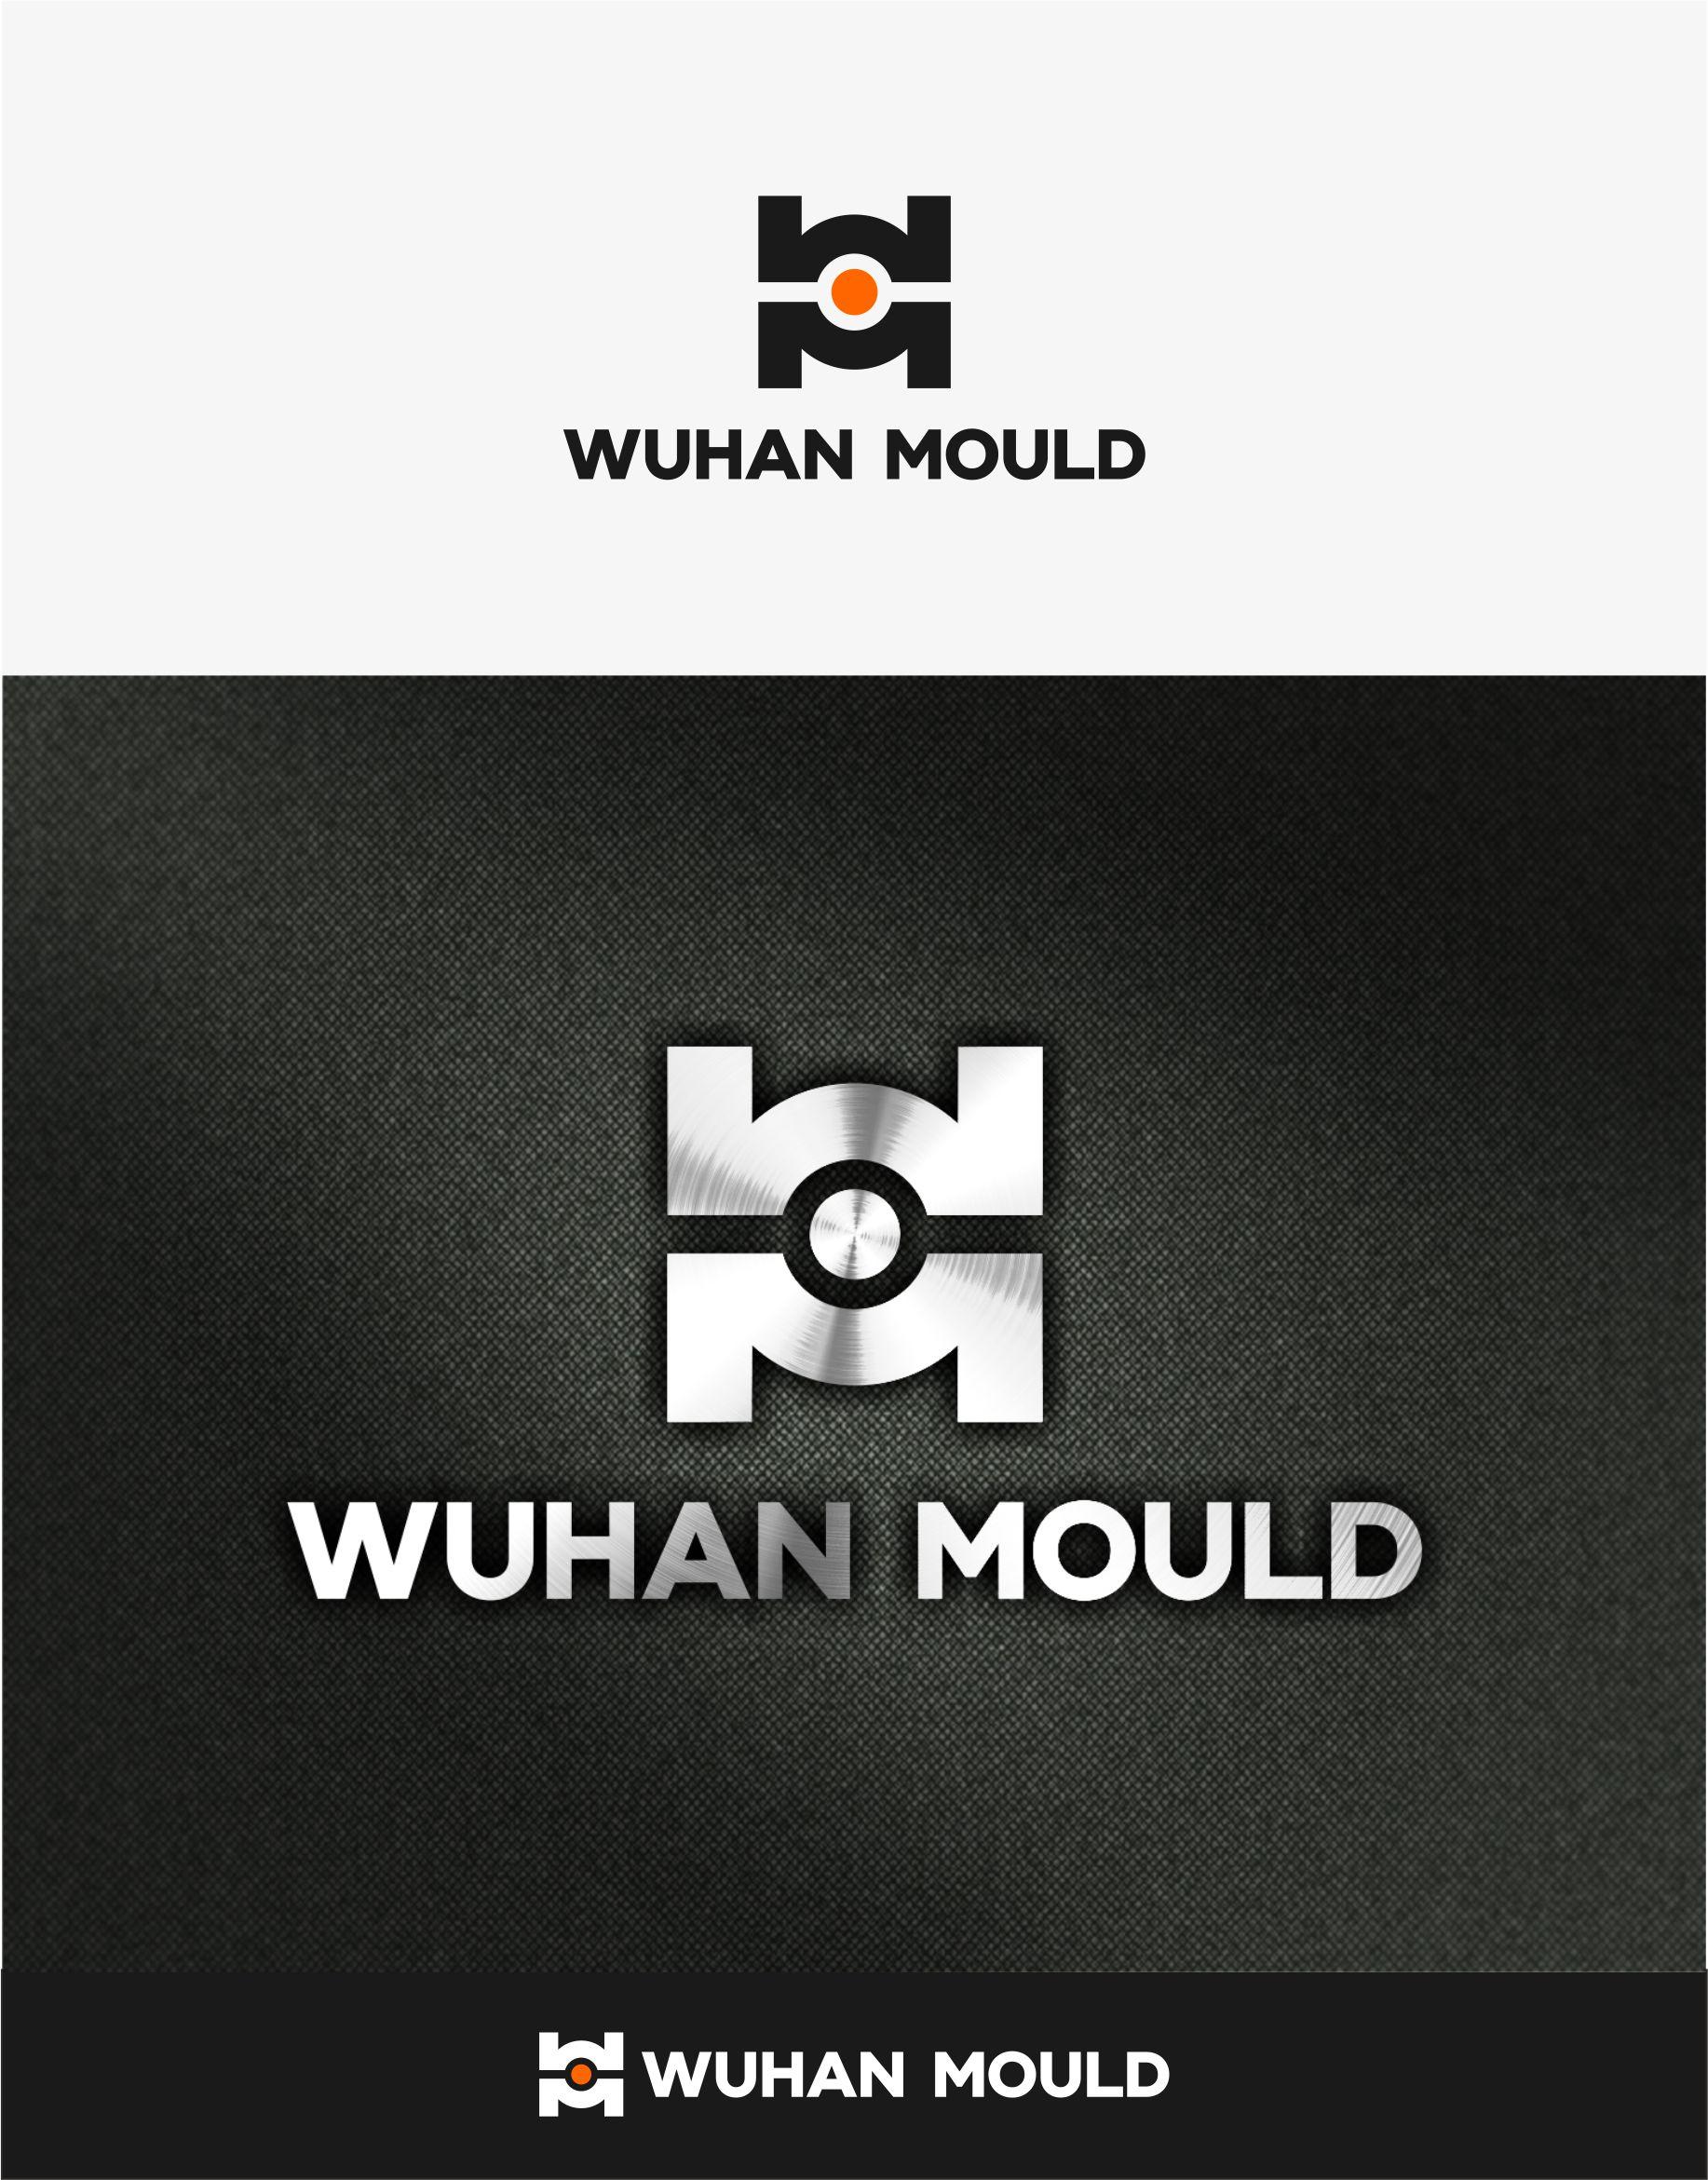 Создать логотип для фабрики пресс-форм фото f_354598a0e7e9a0fd.jpg